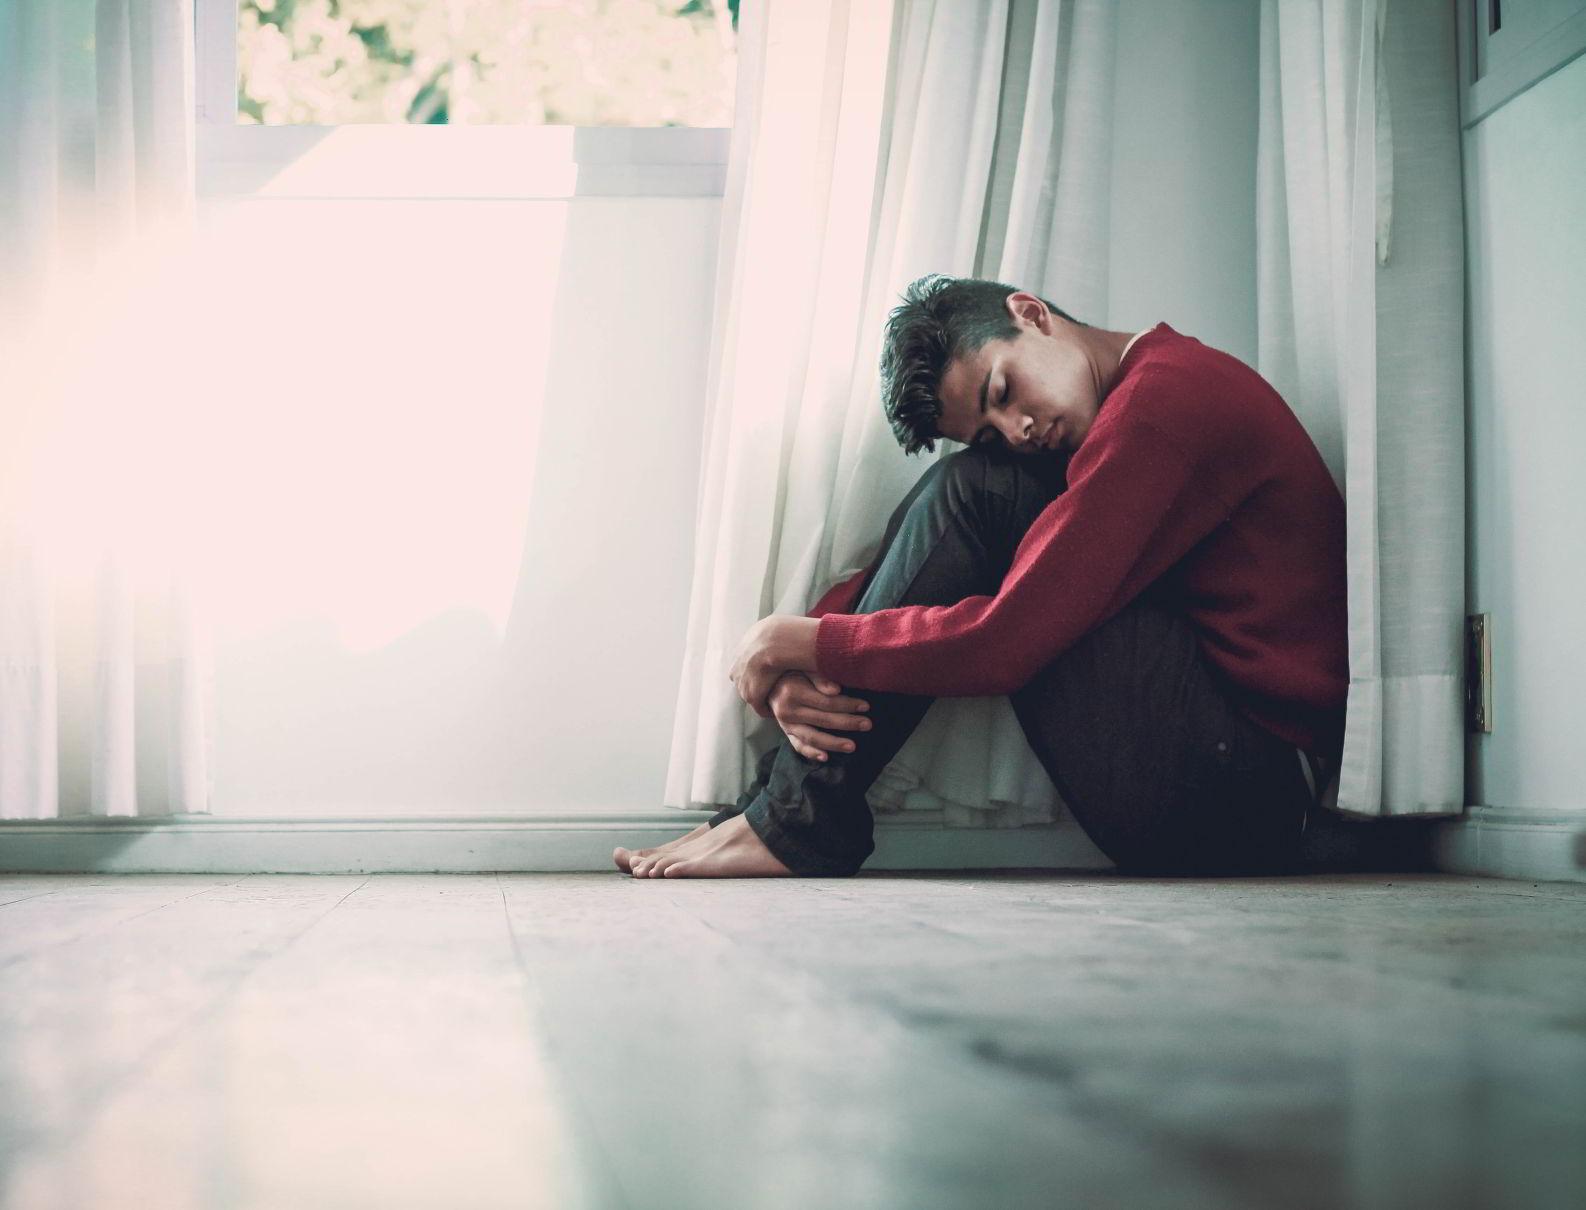 Tristeza Depresion Temor Psicologia